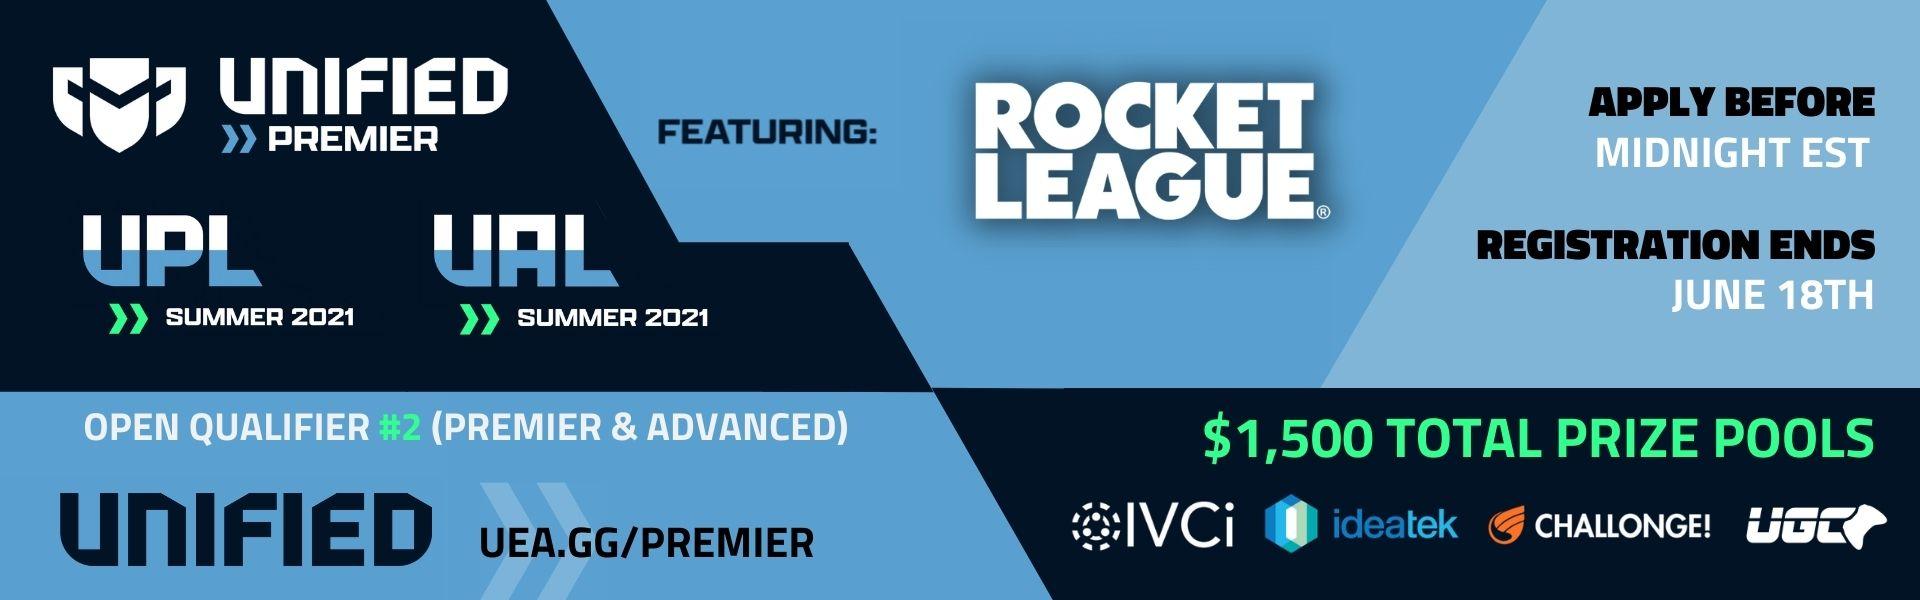 Unified Rocket League Open Qualifier #2